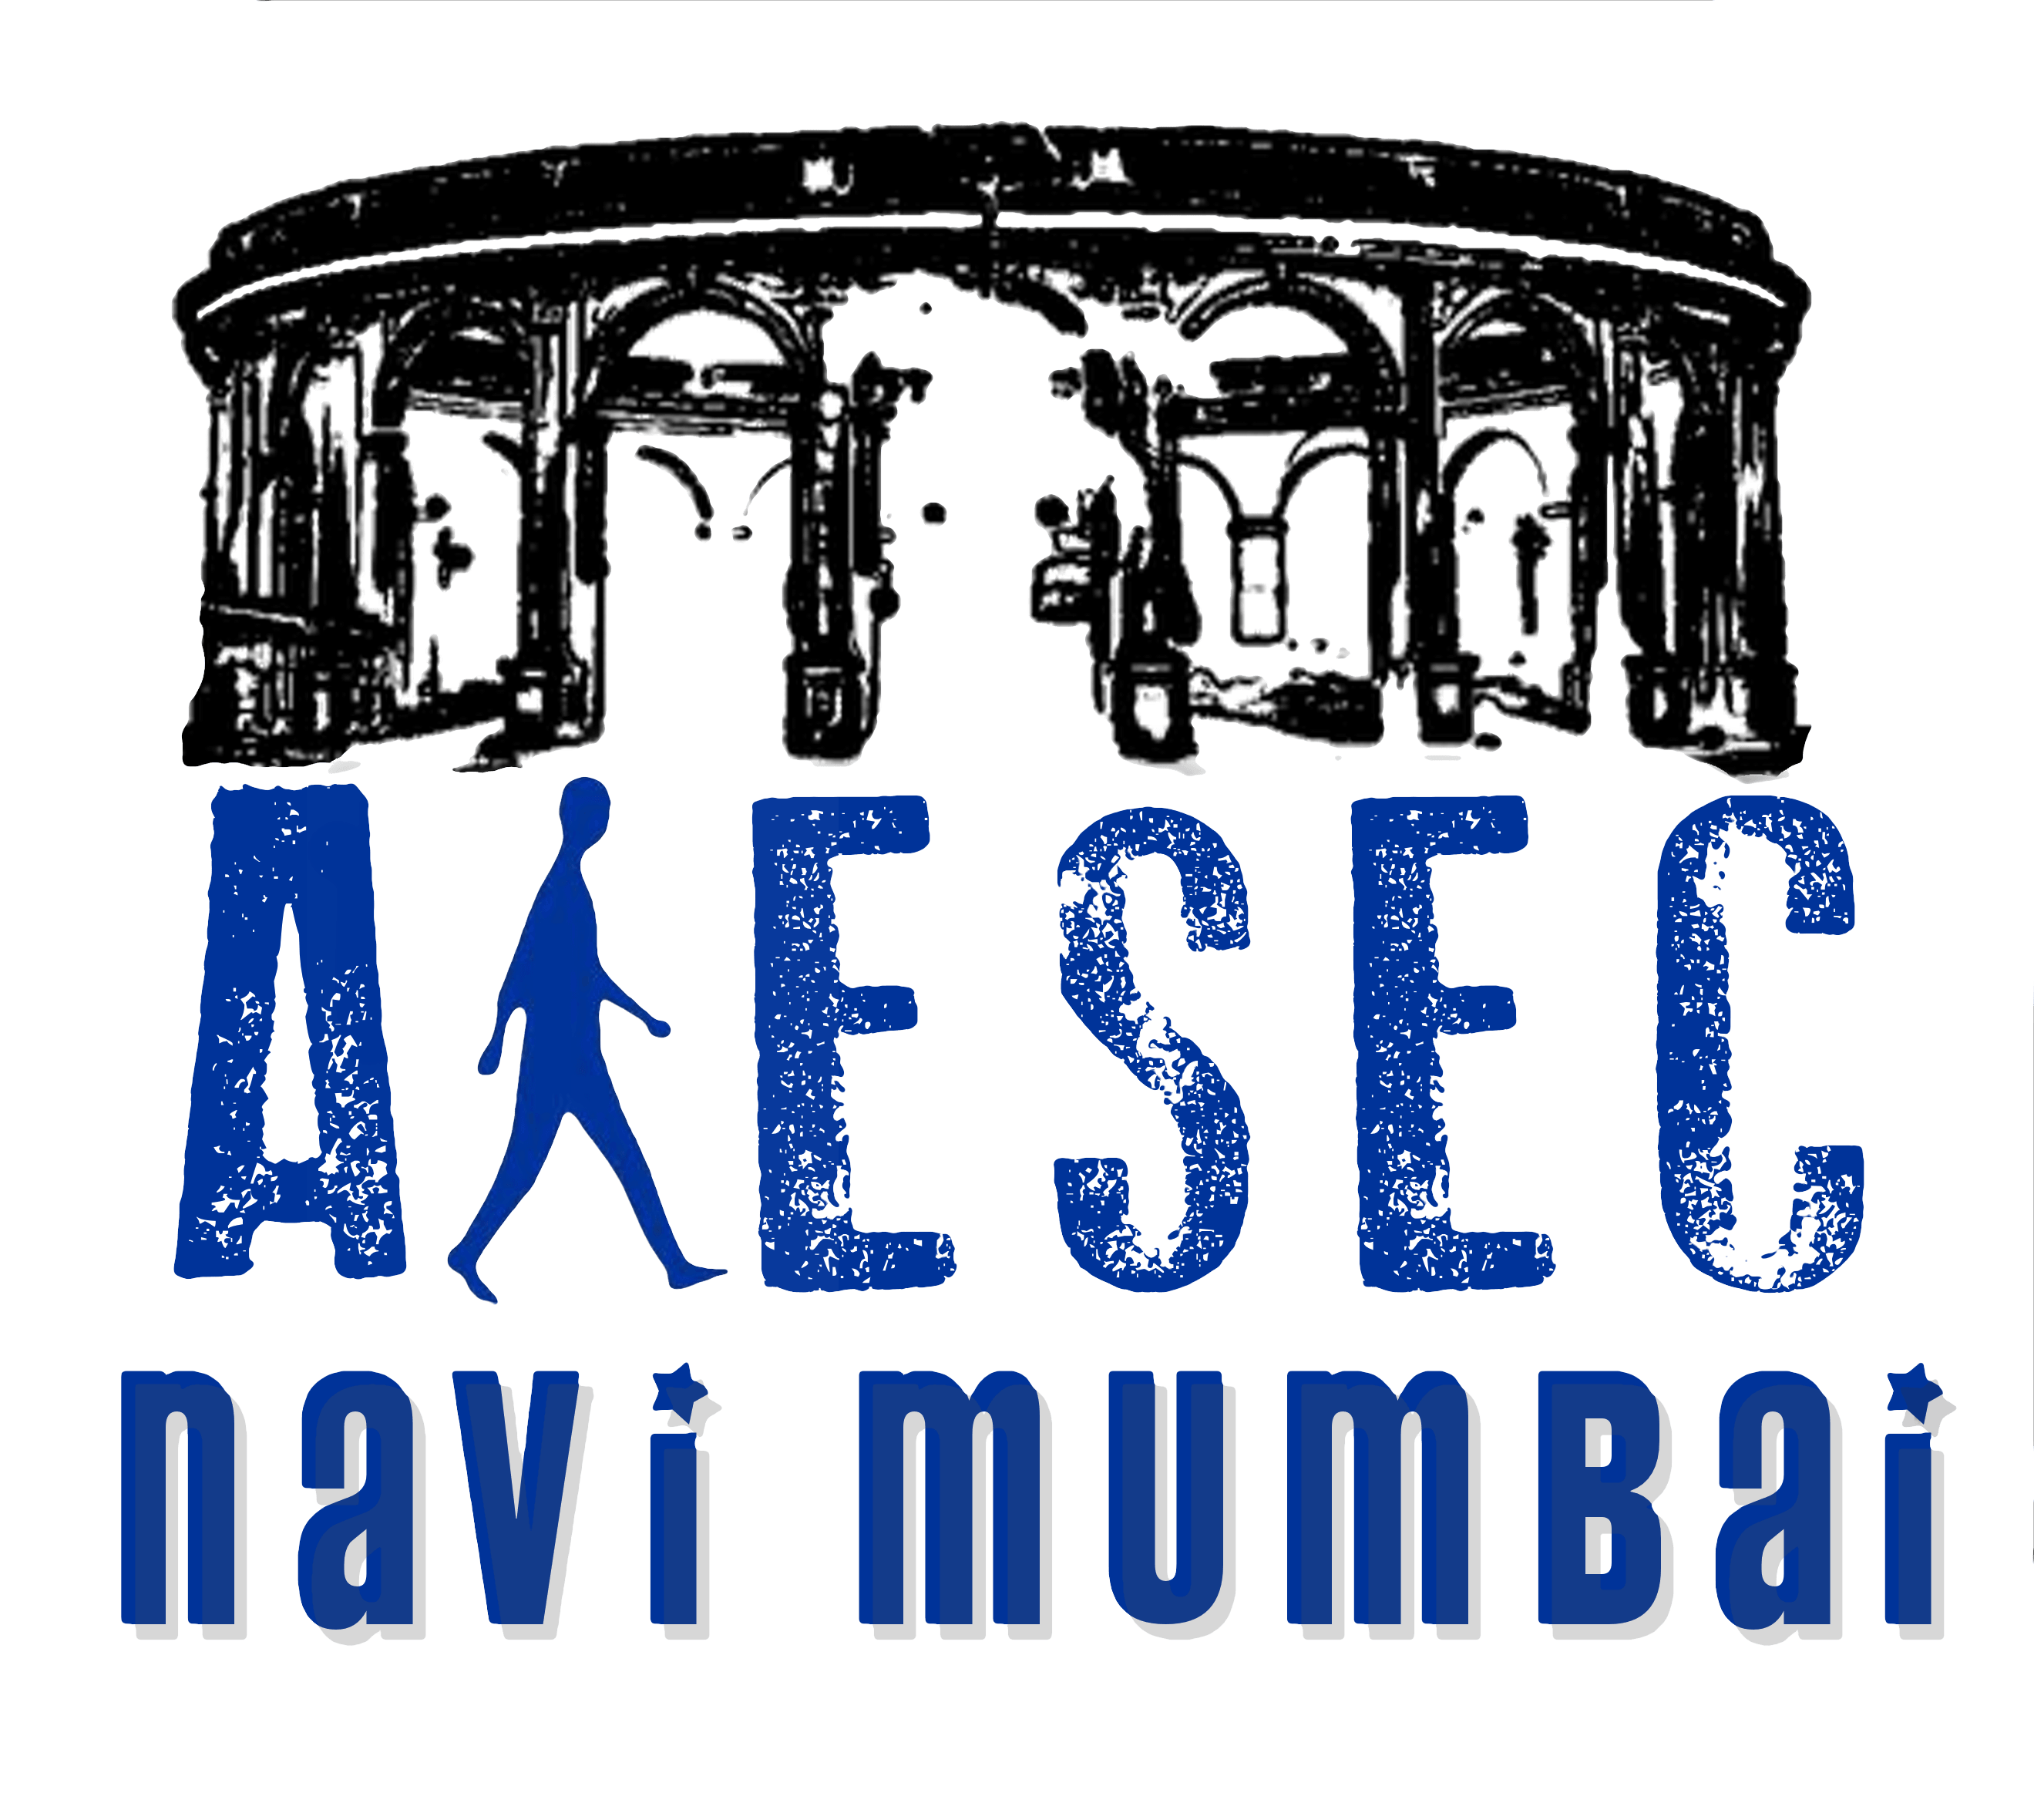 Contact details navi mumbai. Emergency clipart important phone number